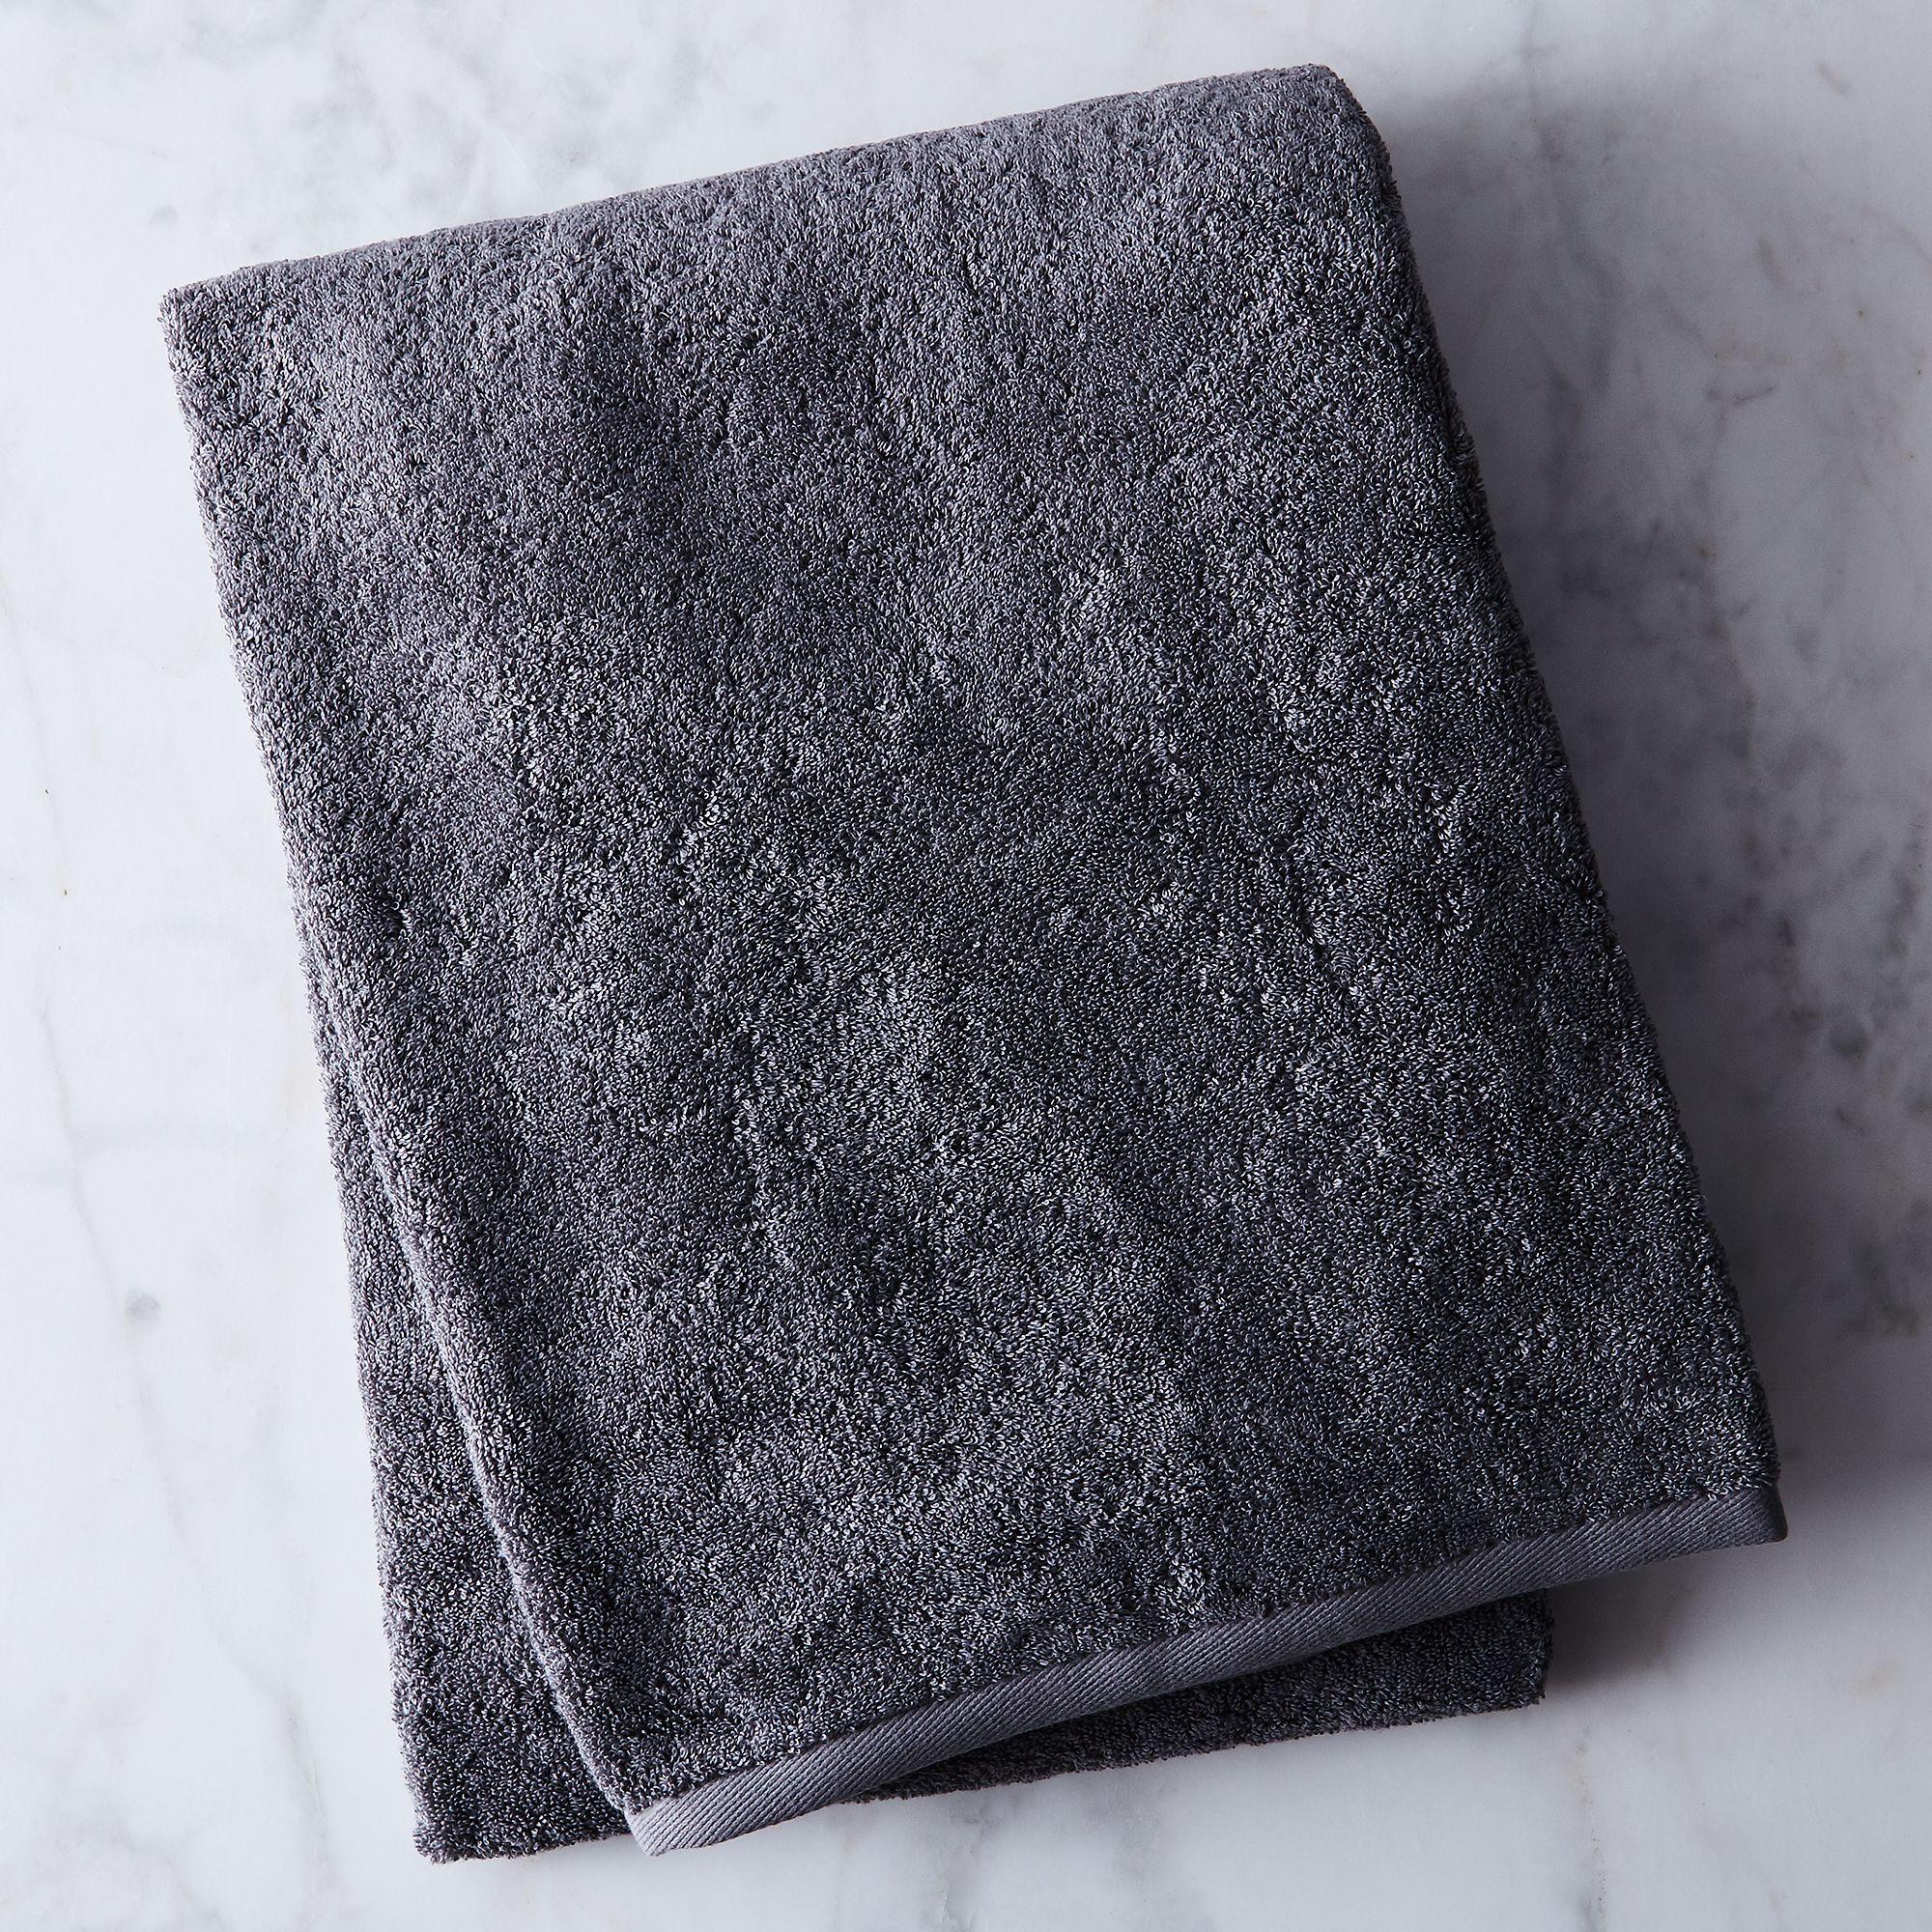 C6478f20 c841 4e43 88ac db1ec99cdd2f  2017 0926 snowe home soft cotton towels bath sheet charcoal grey silo rocky luten 006